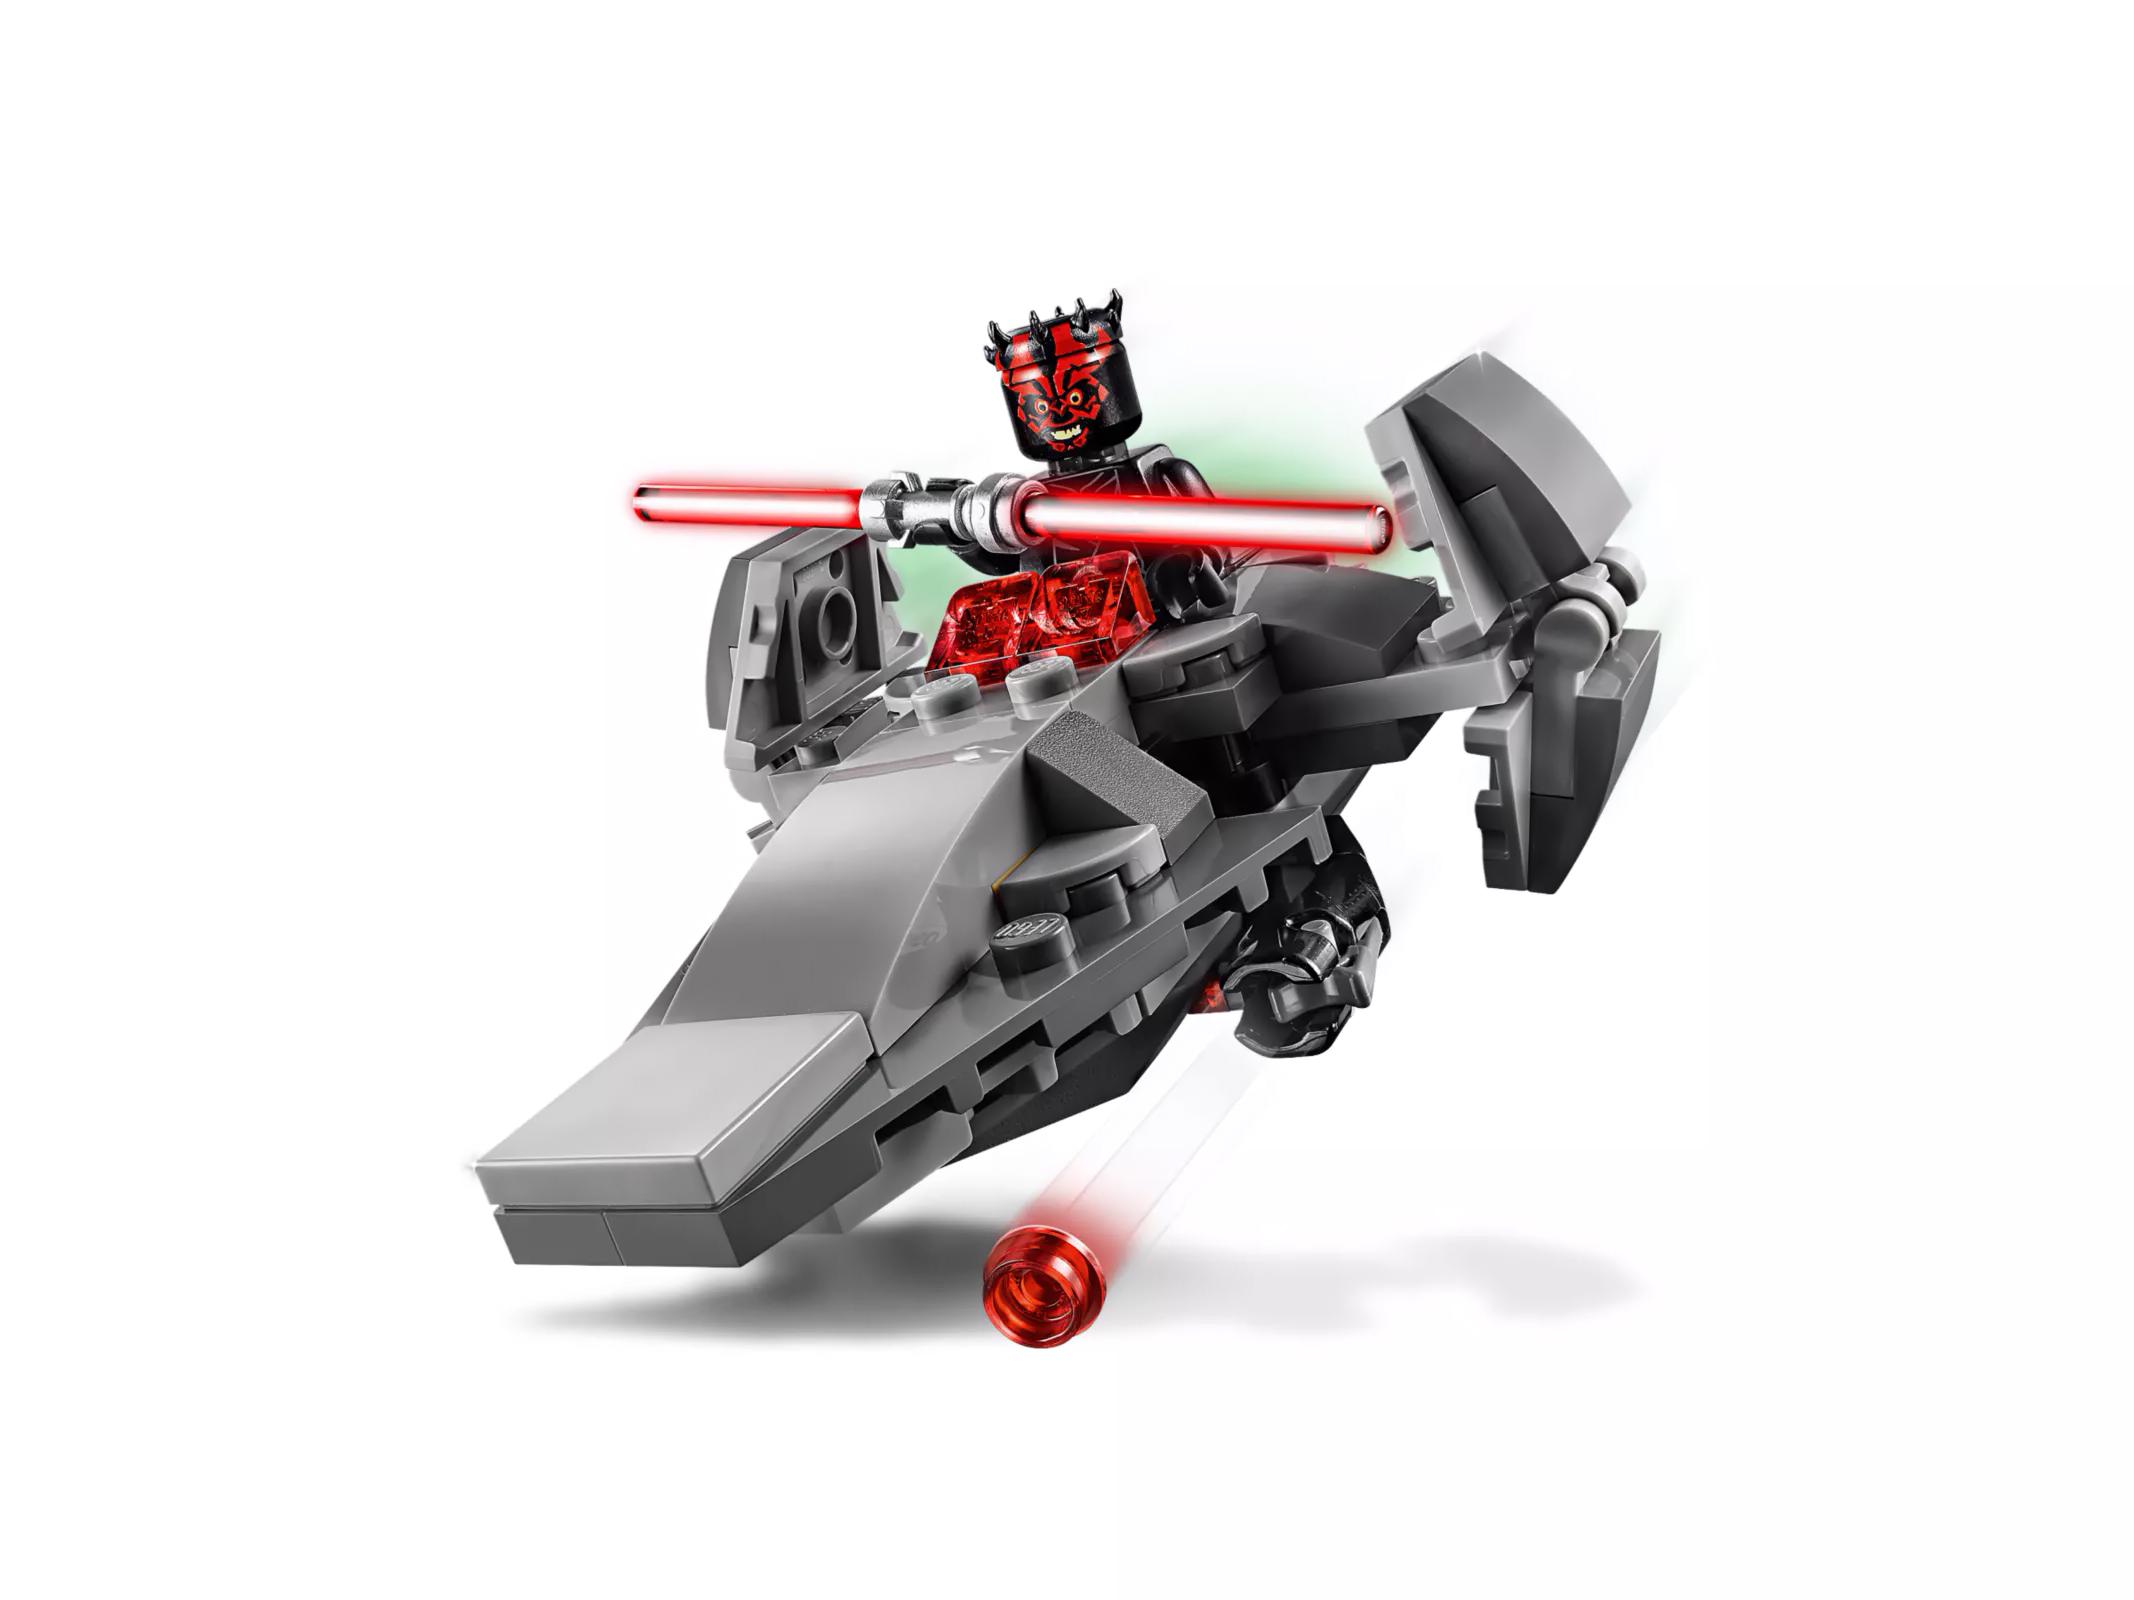 75224-lego-star-wars-sith-infiltrator-microfighter-3.jpg